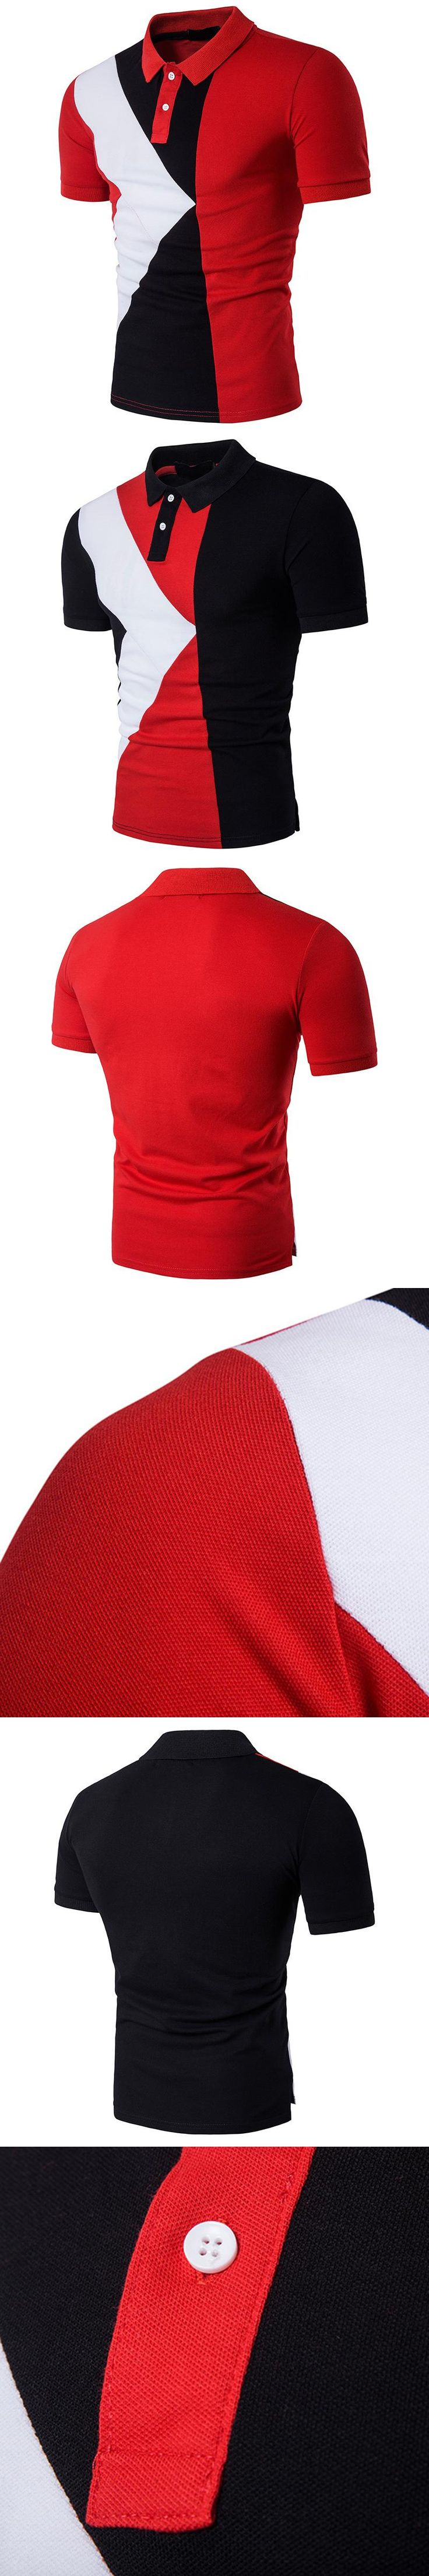 2017 Summer Fashion Mens Polo Shirt Cotton Geometric Stitching Short Sleeve Casual Shirt For Men Classic Casual Polos 13B65